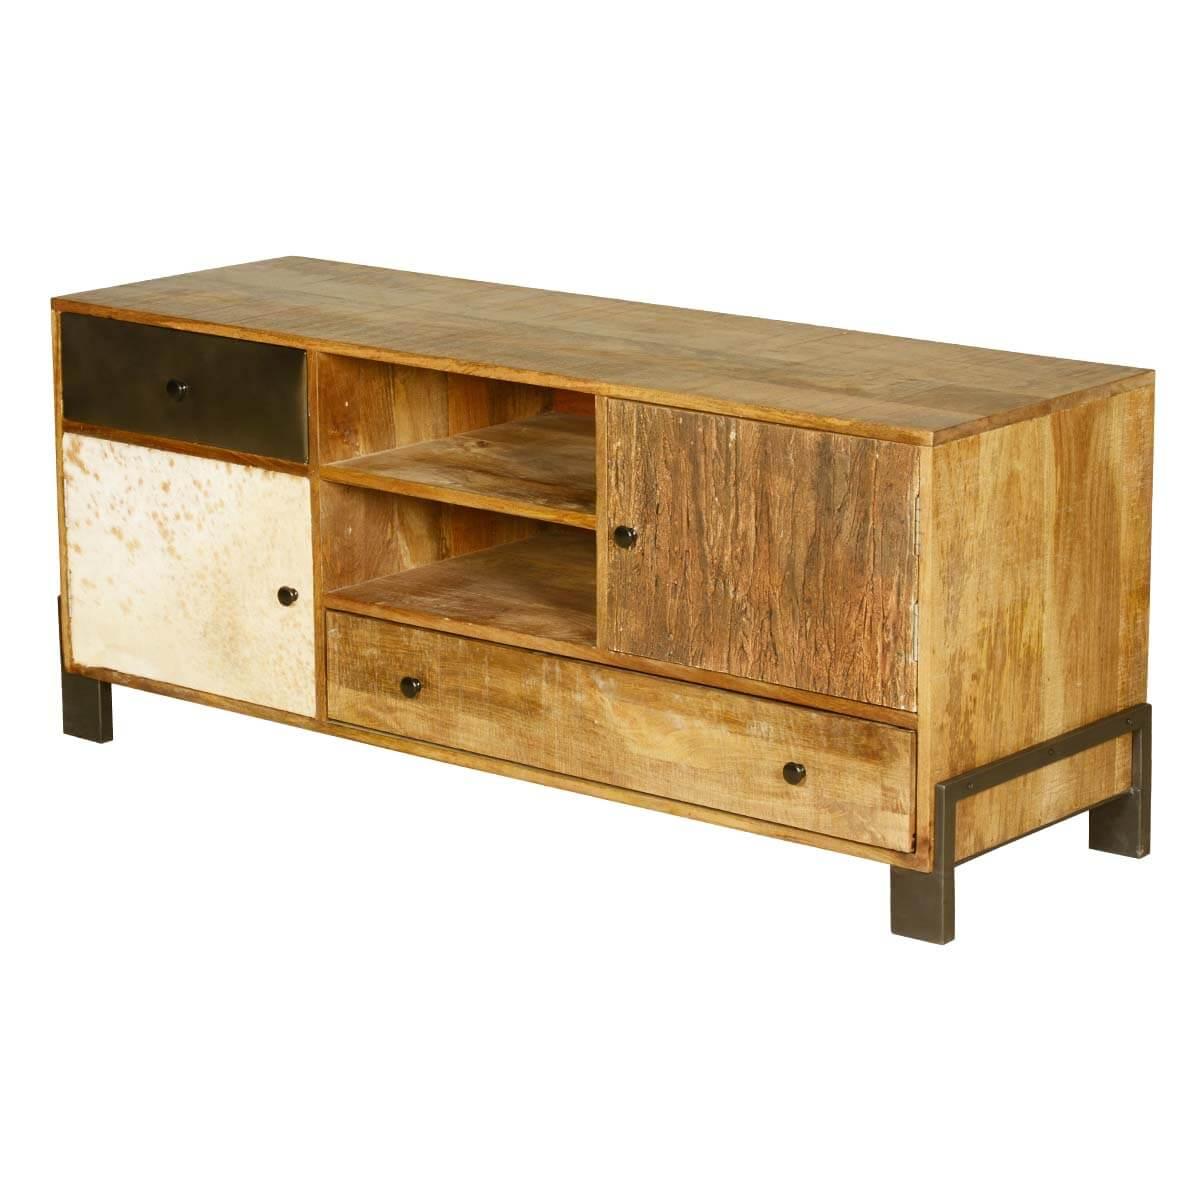 60u0027s retro mango wood u0026 iron 6 compartment tv rustic media console